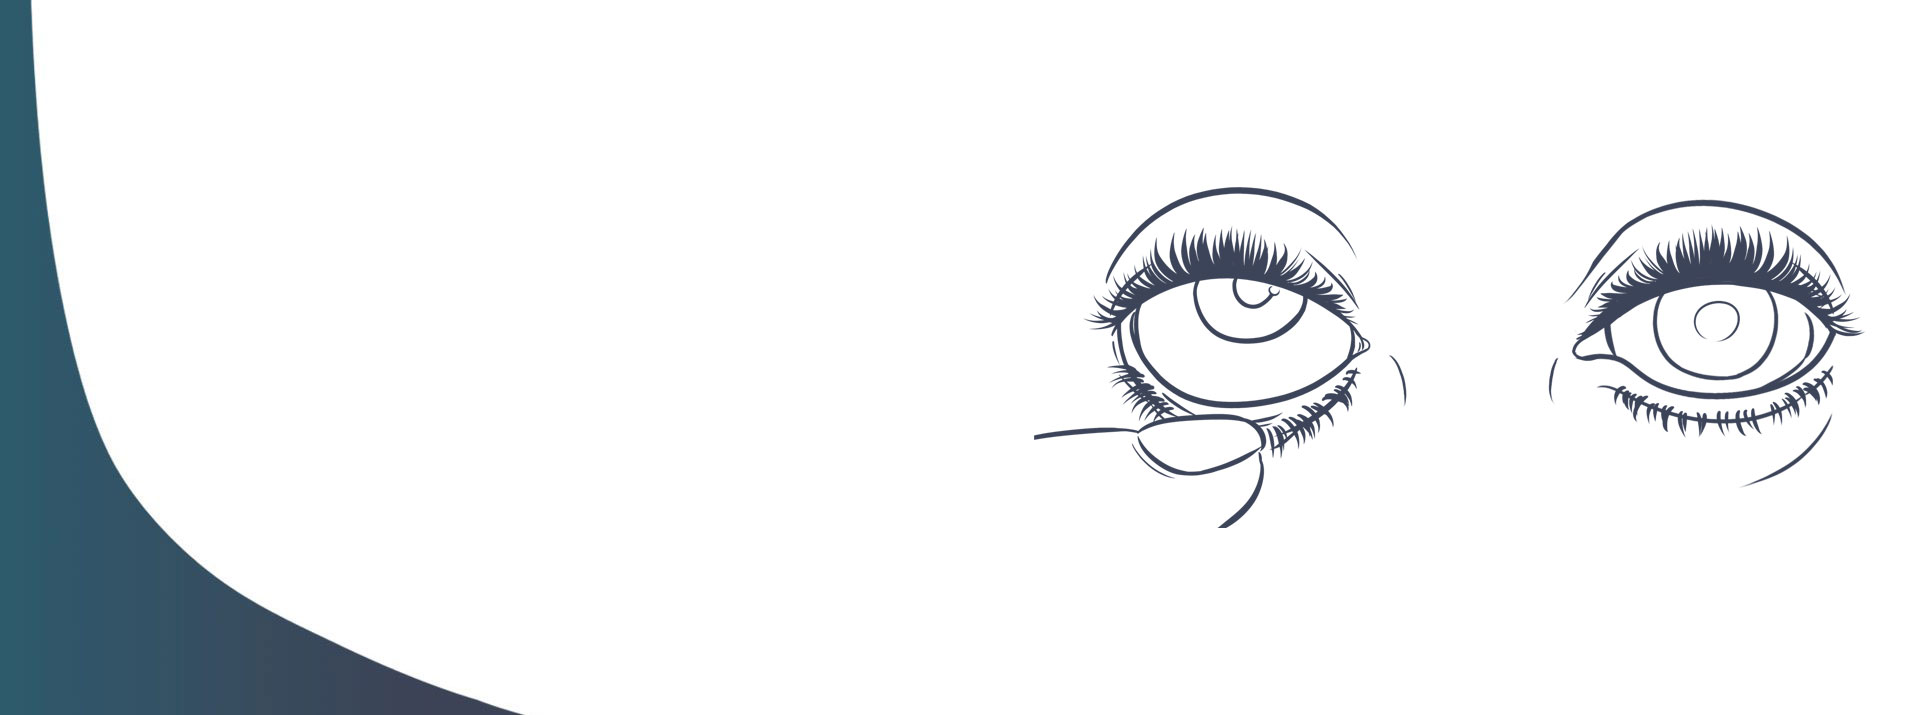 Cómo retirar y ponerla prótesis ocular